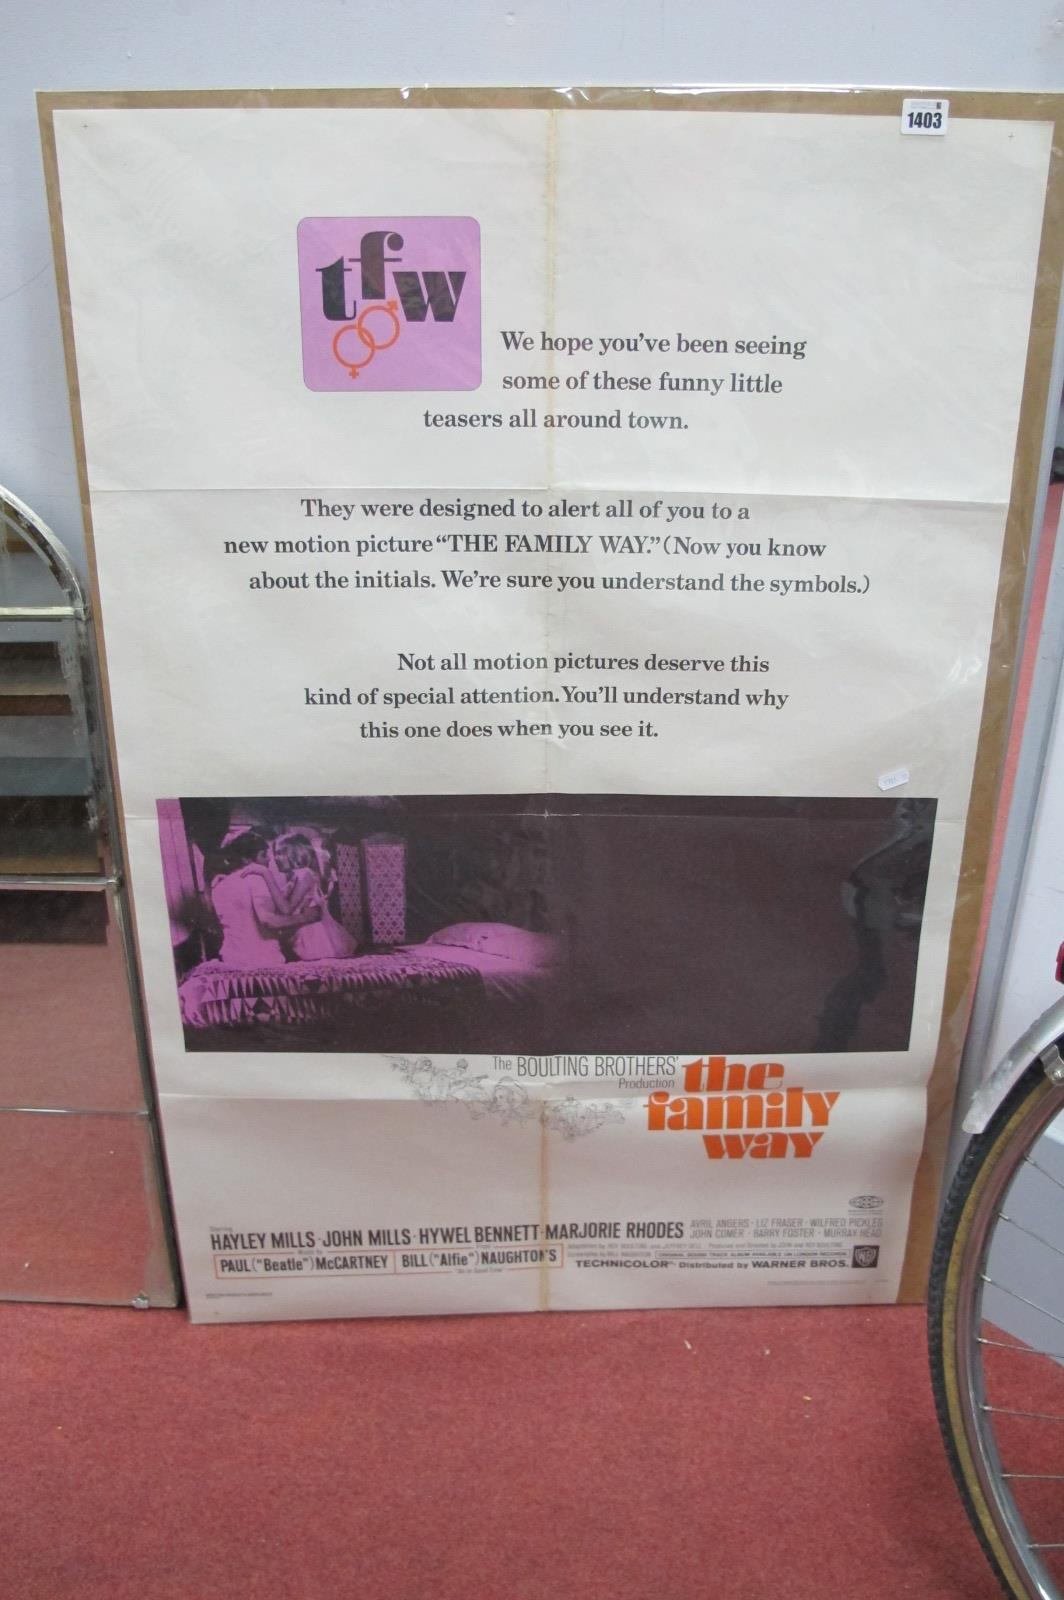 Film Posters 'The Family Way' starring Haley Mills, John Mills, Hywel Bennett 104.5 x 68.5cm.